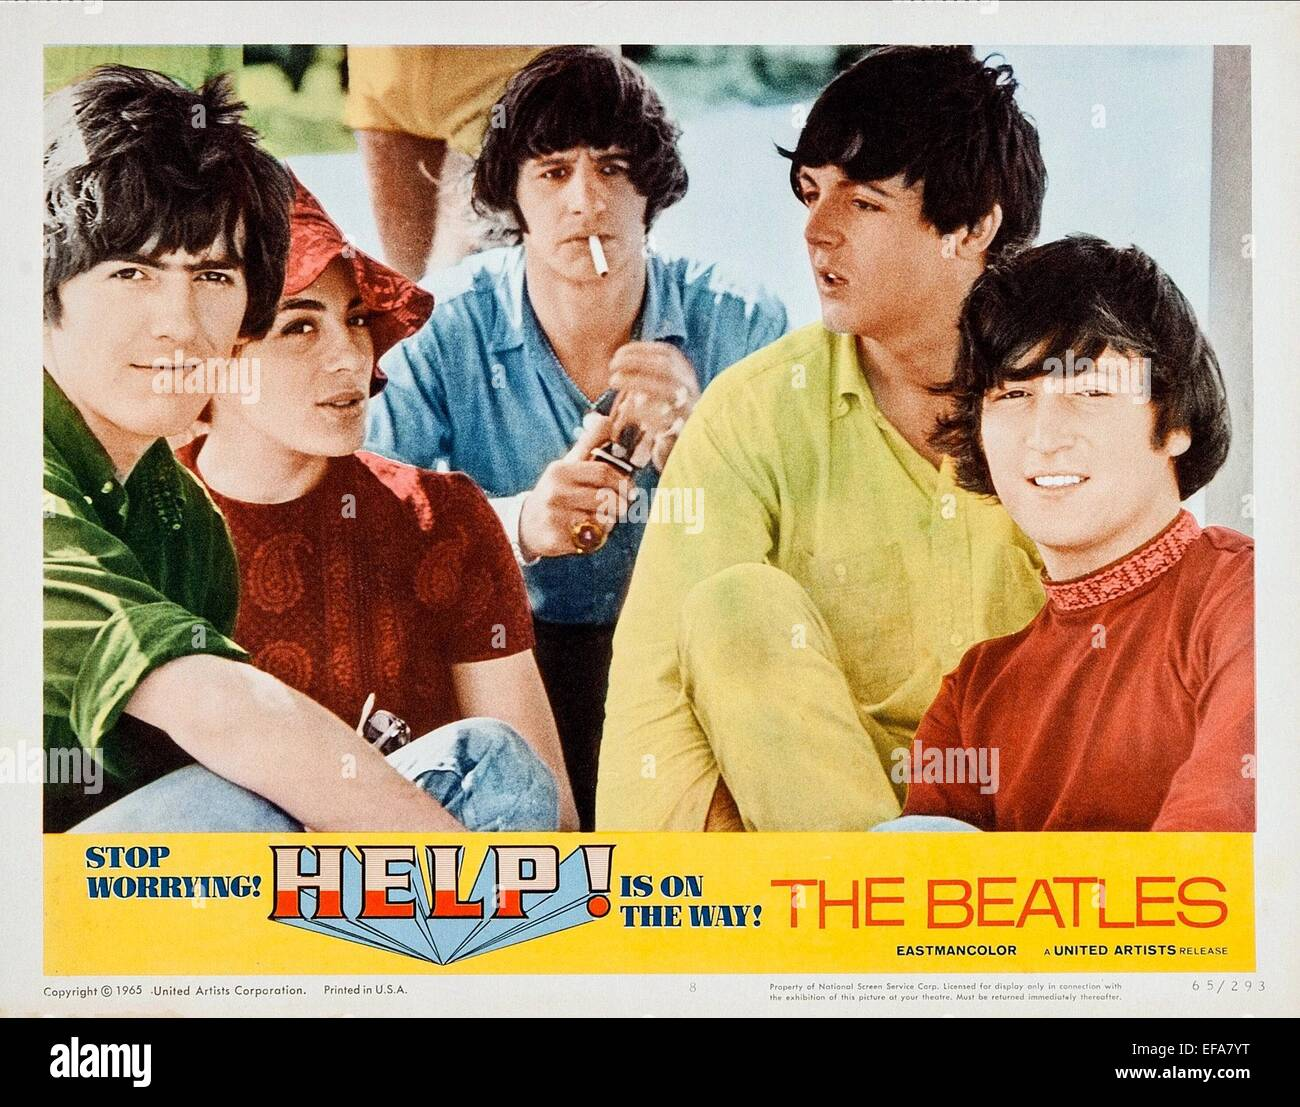 GEORGE HARRISON, ELEANOR BRON, RINGO STARR, PAUL MCCARTNEY, JOHN LENNON, HELP!, 1965 - Stock Image